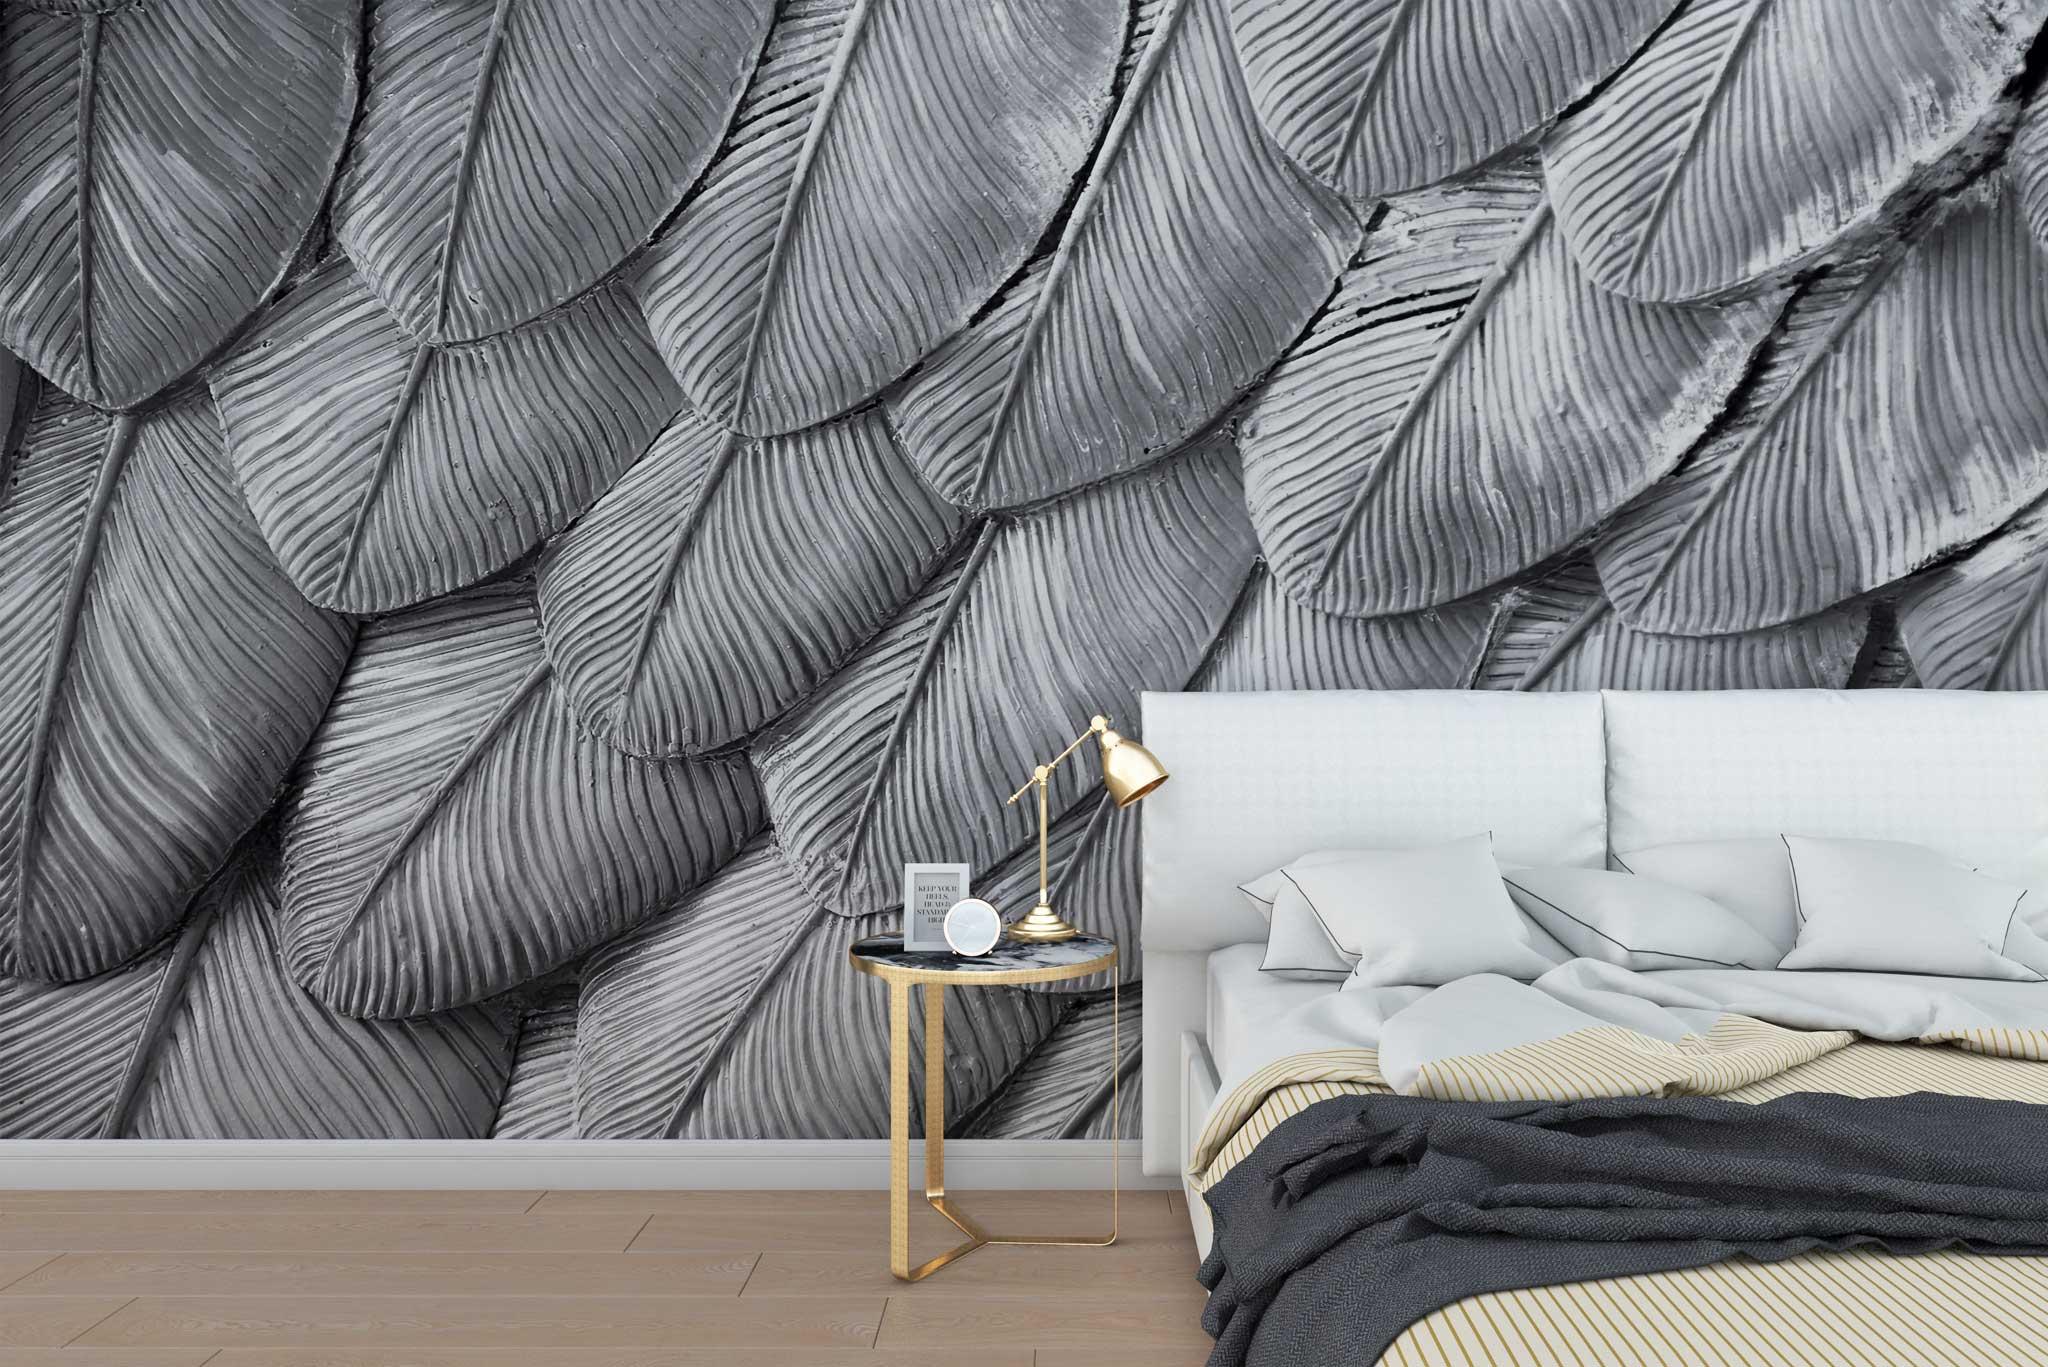 tapet-fototapet-special-personalizat-customizabil-comanda-bucuresti-daring-prints-model-pene-argintii-alb-negru